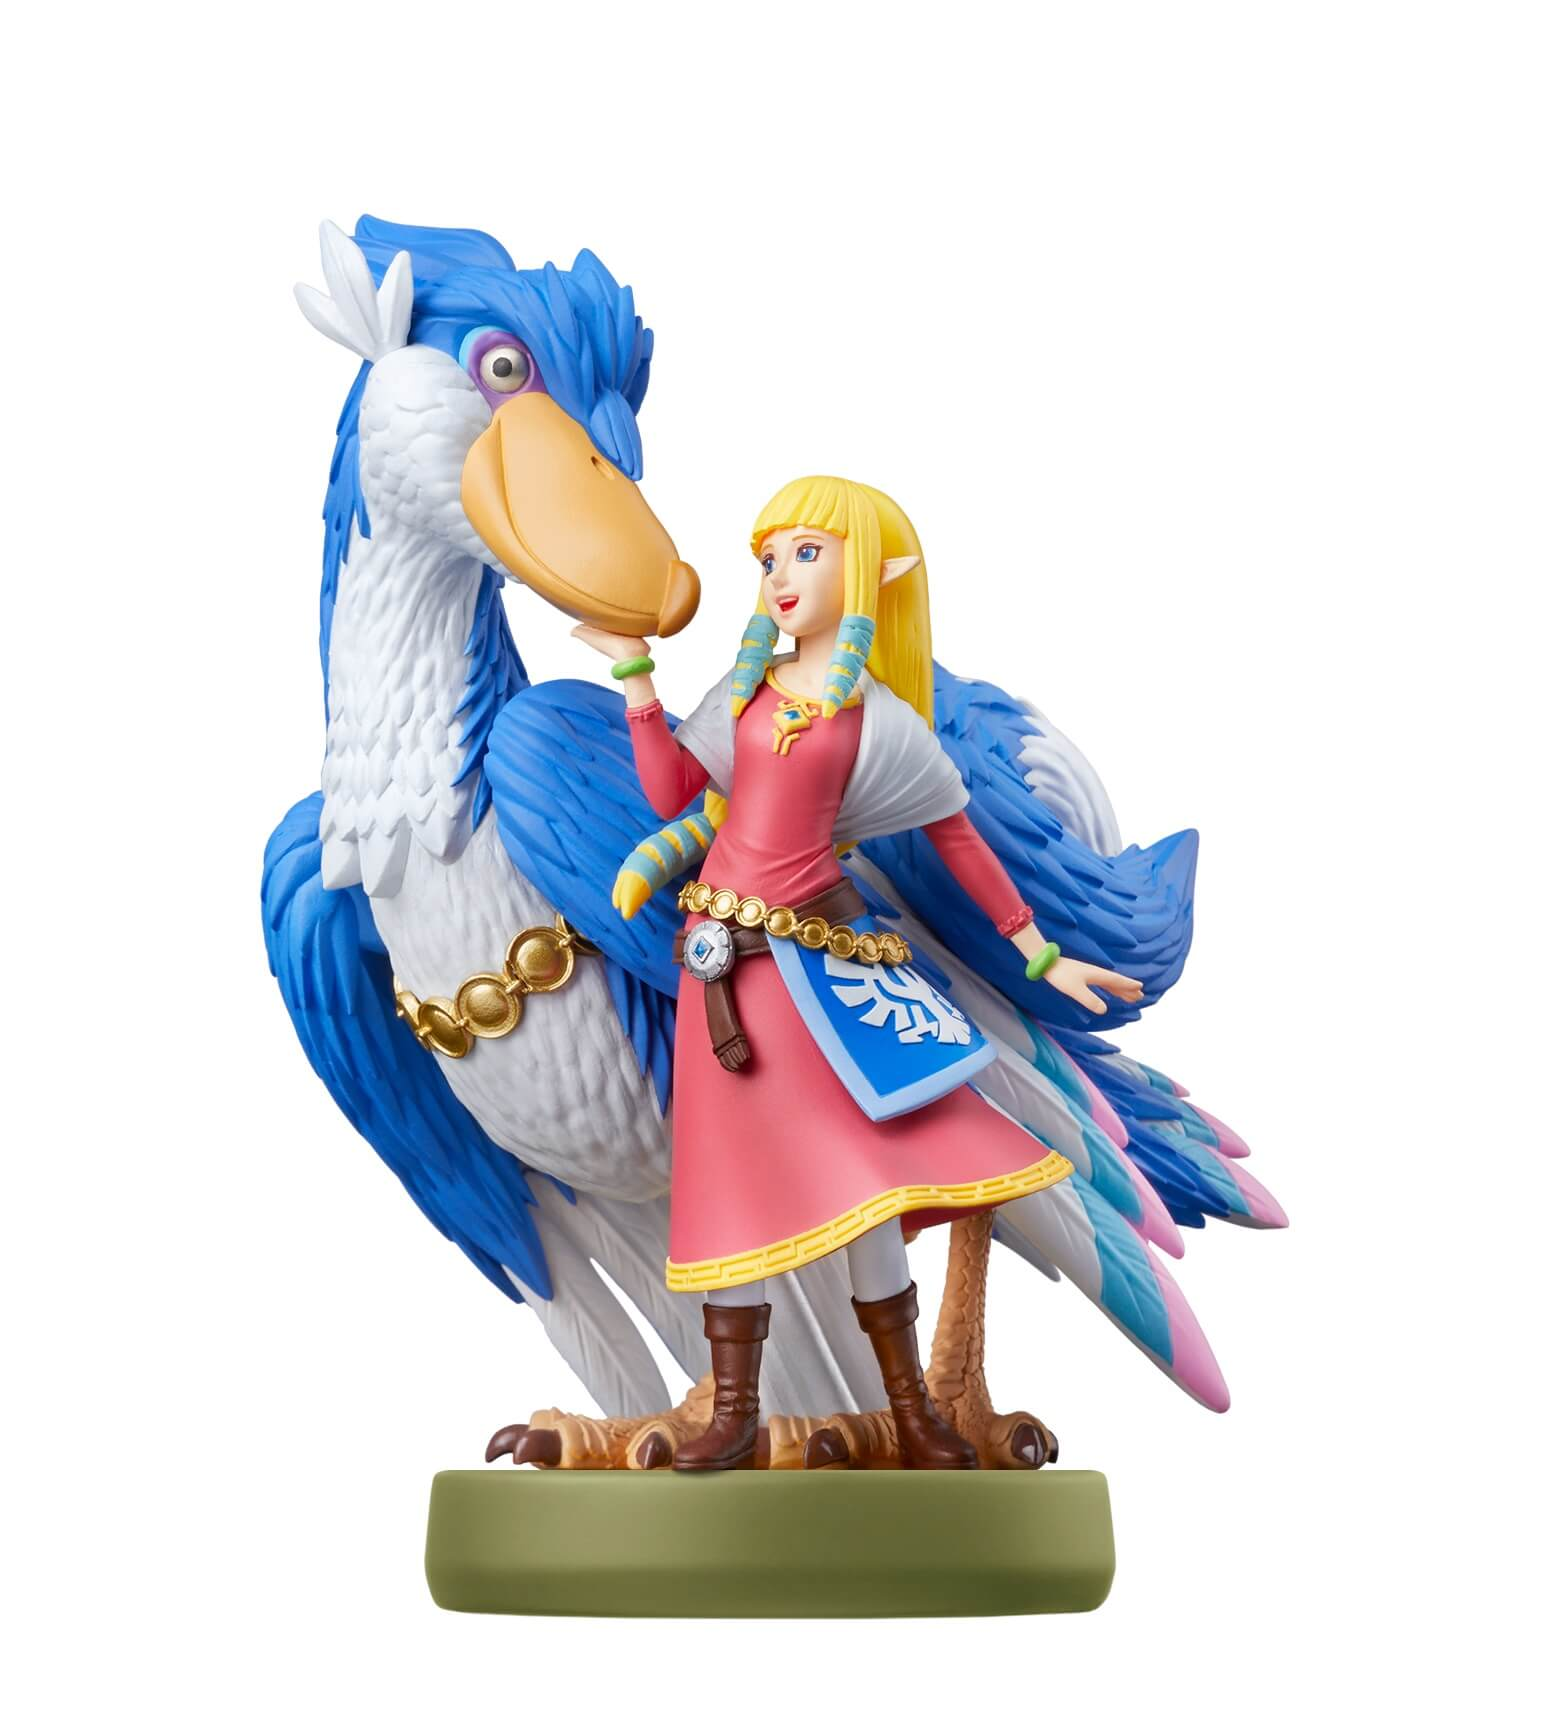 The Legend of Zelda Skyward Sword: amiibo Figur von Zelda und Loftwing